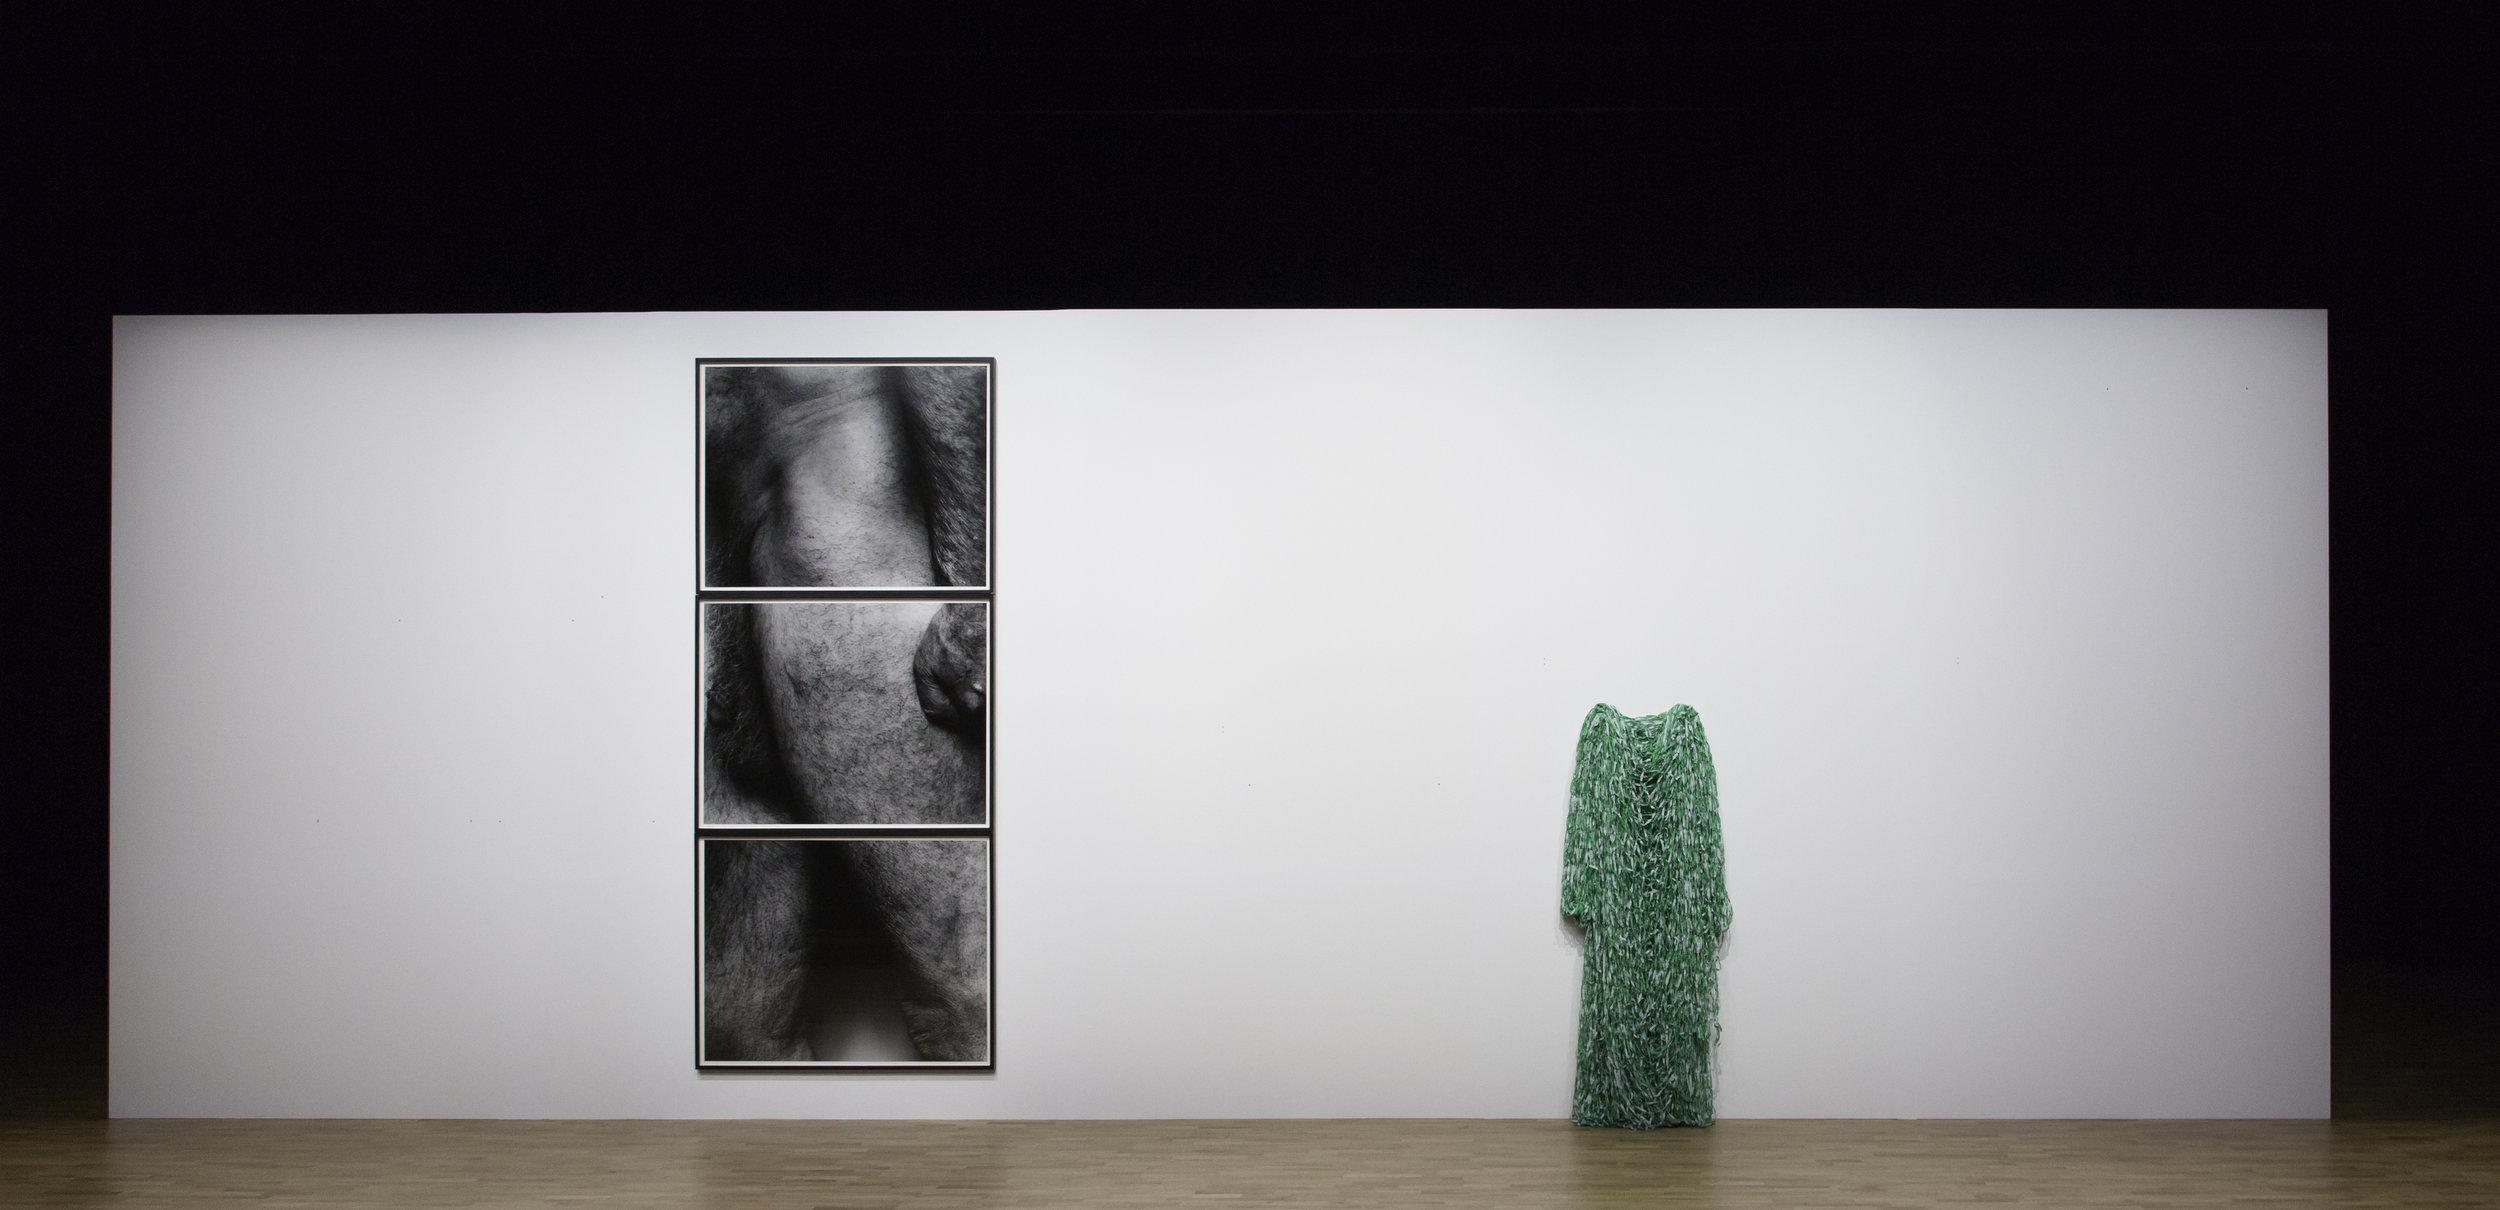 2017 09 12©Hervé Veronese Centre Pompidou-3863.jpg